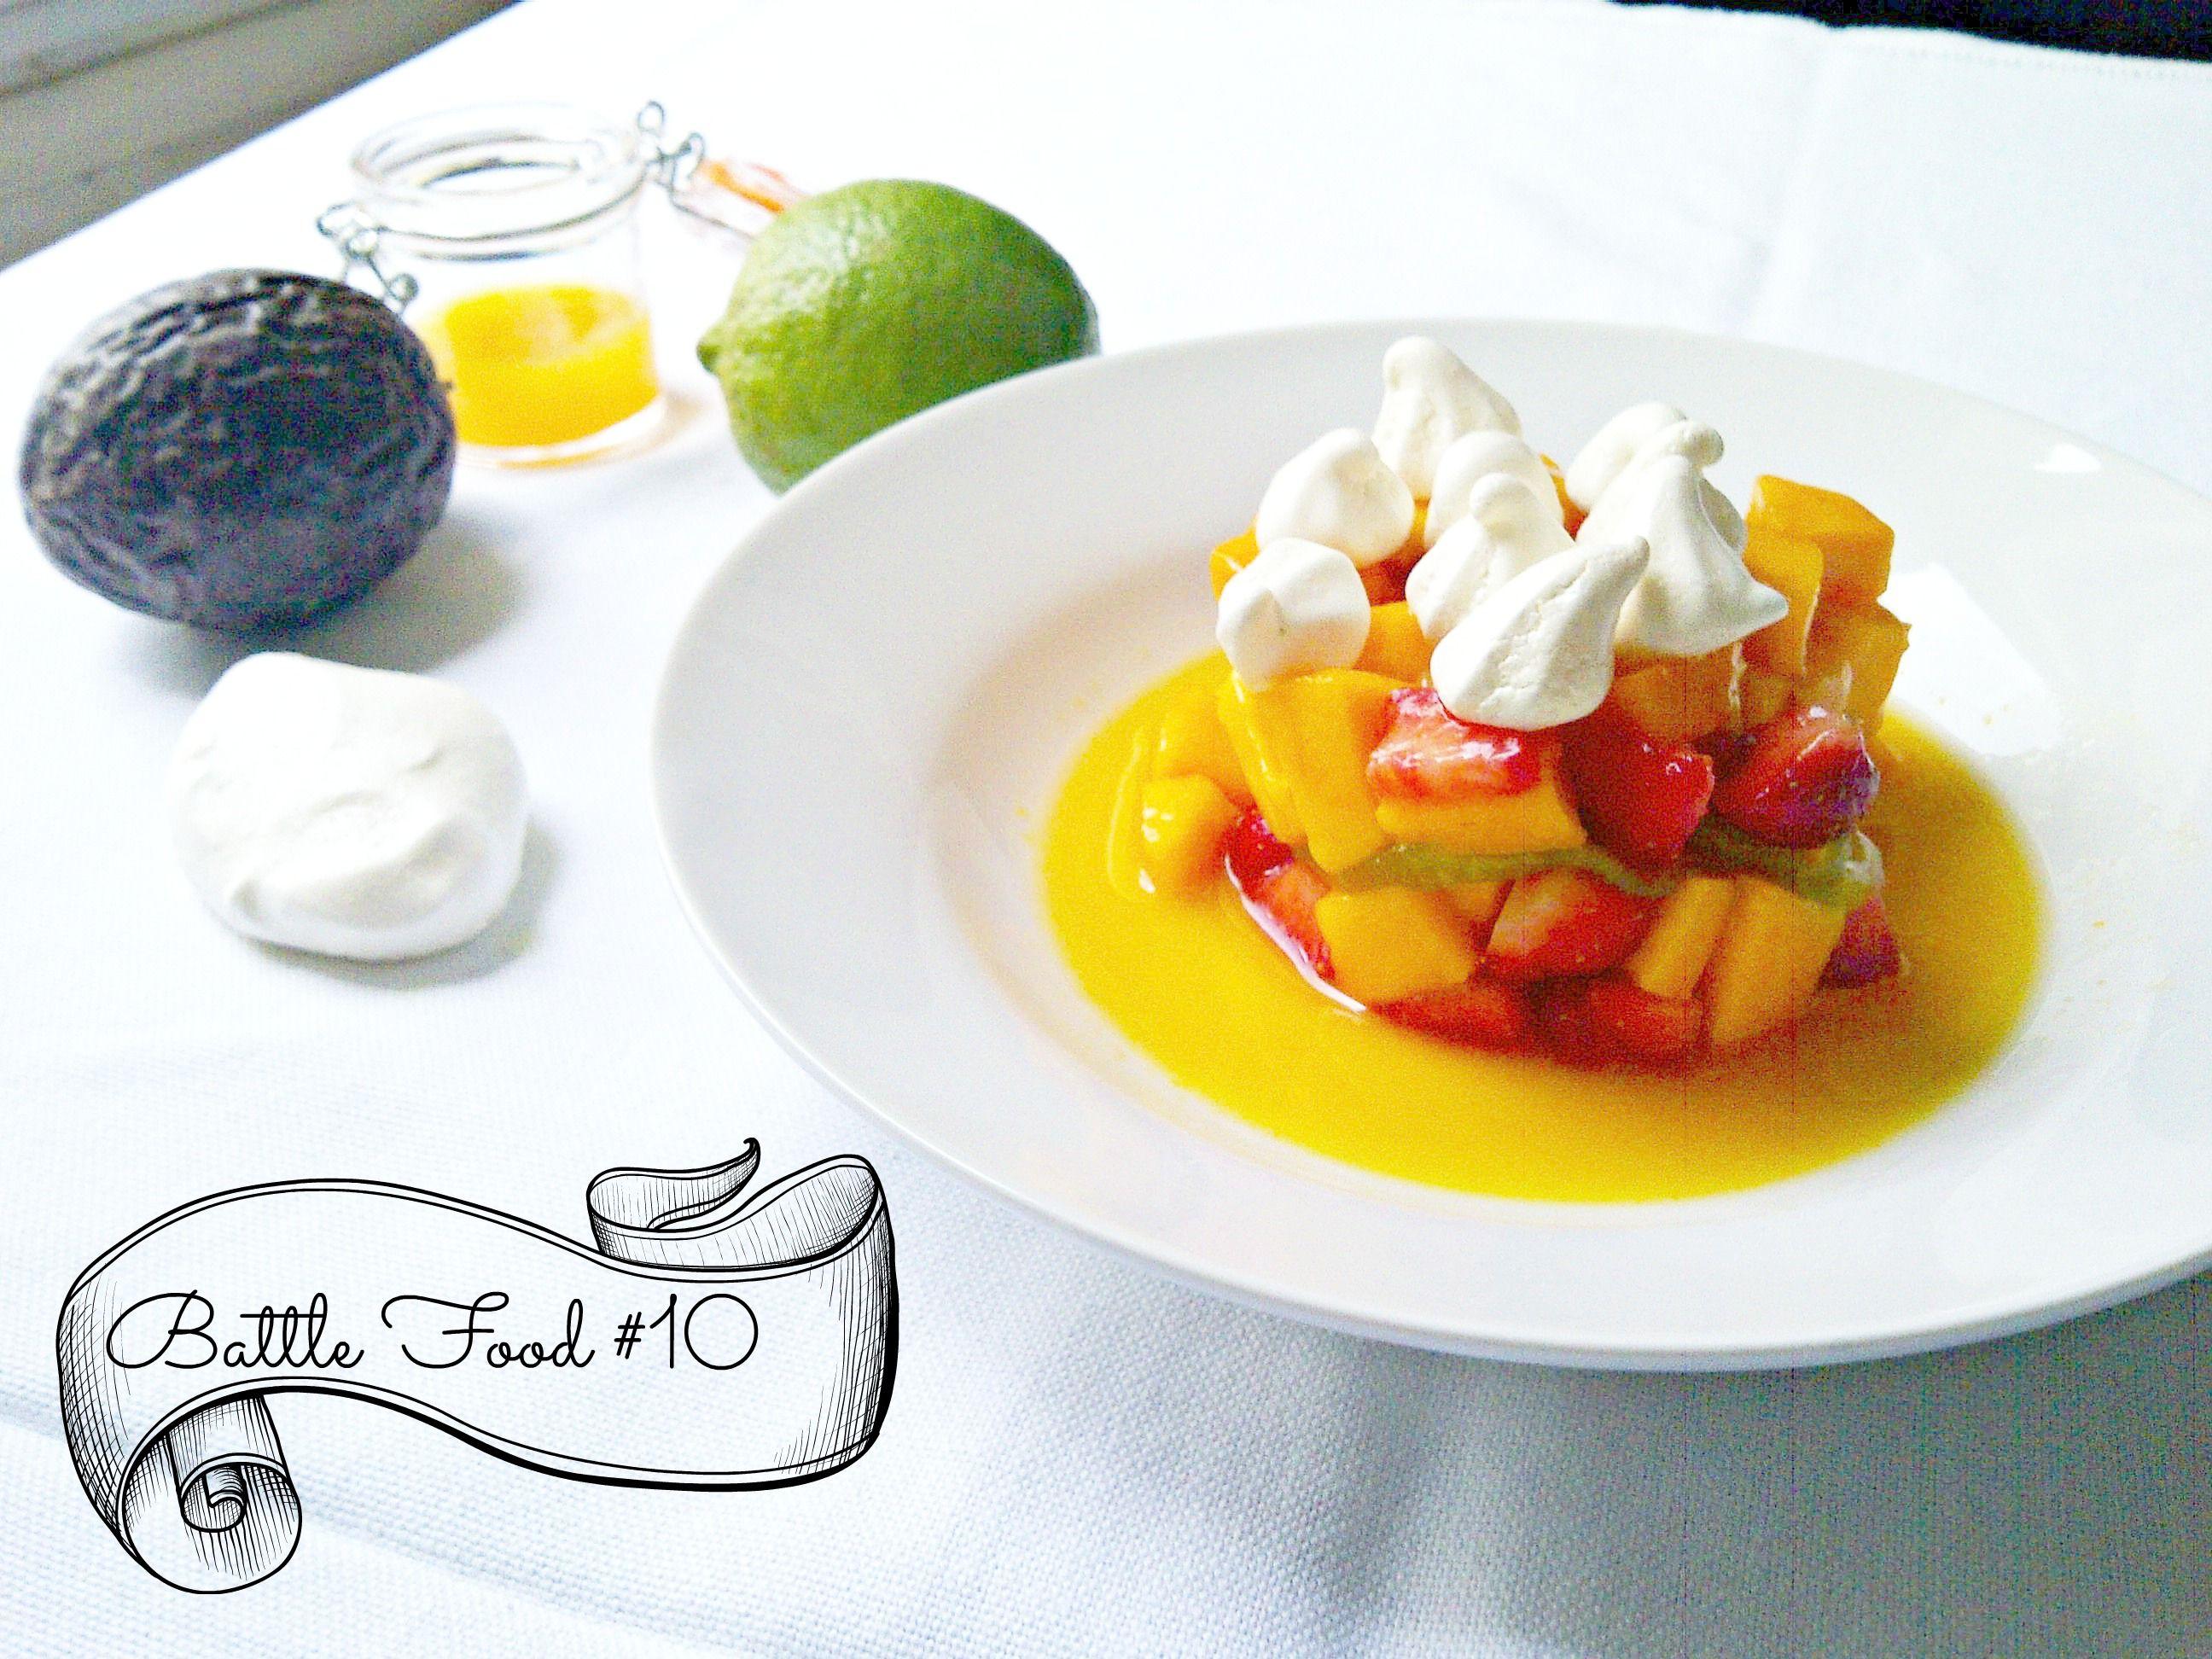 battlefood_mttp_tartaremanguefraise